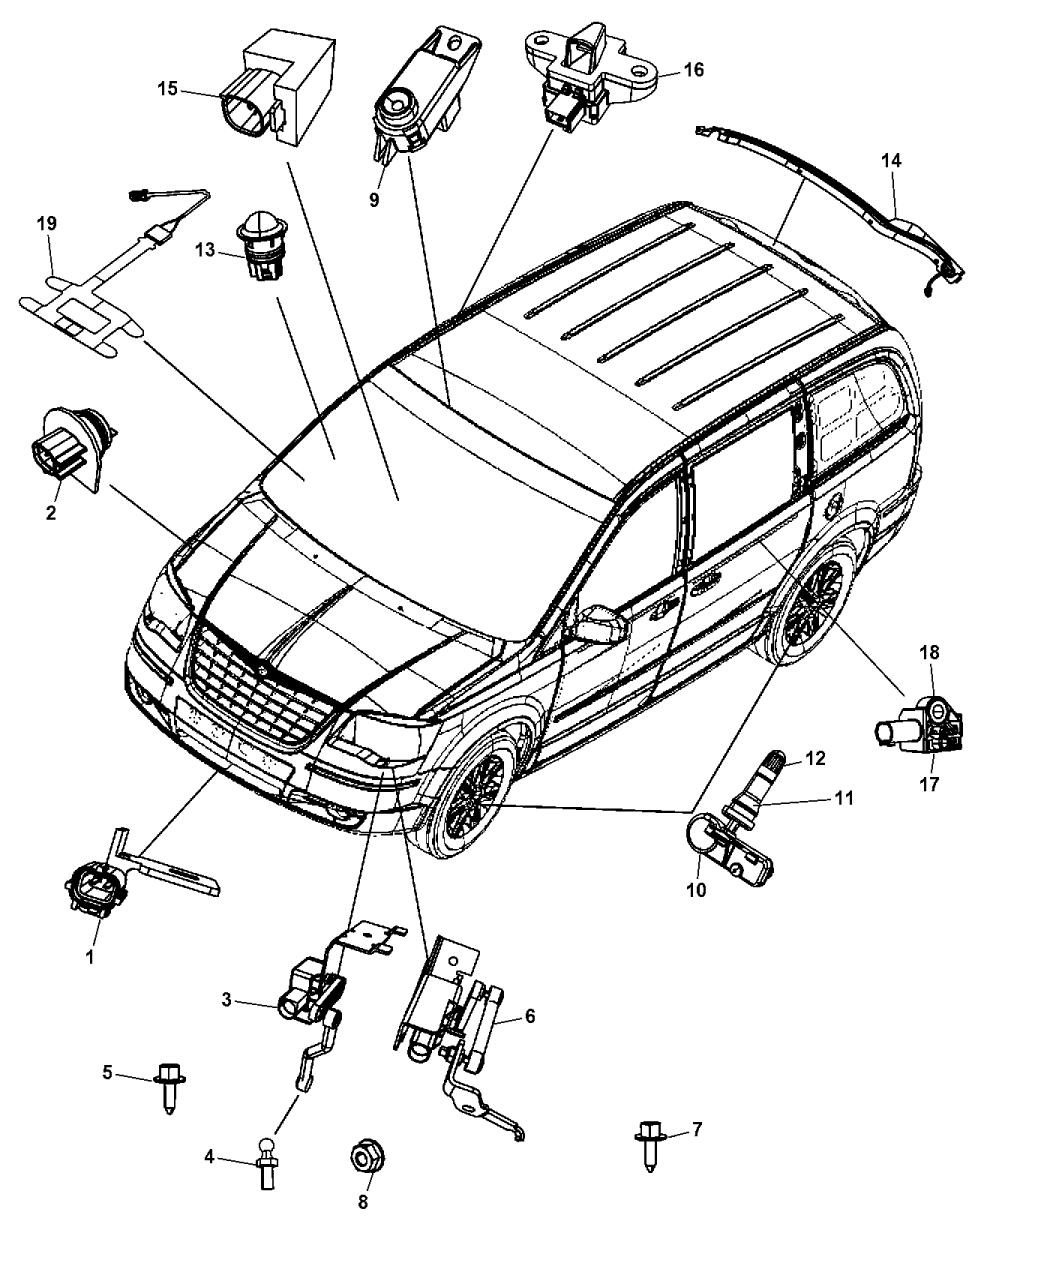 YWRhIHBhcmtpbmcgc3RhbGw moreover Chrysler Sensor Pinch 68078772ac moreover P 0996b43f8037fe8b as well P 0996b43f8037ea21 moreover Electrical Sensors Engine. on tire position diagram